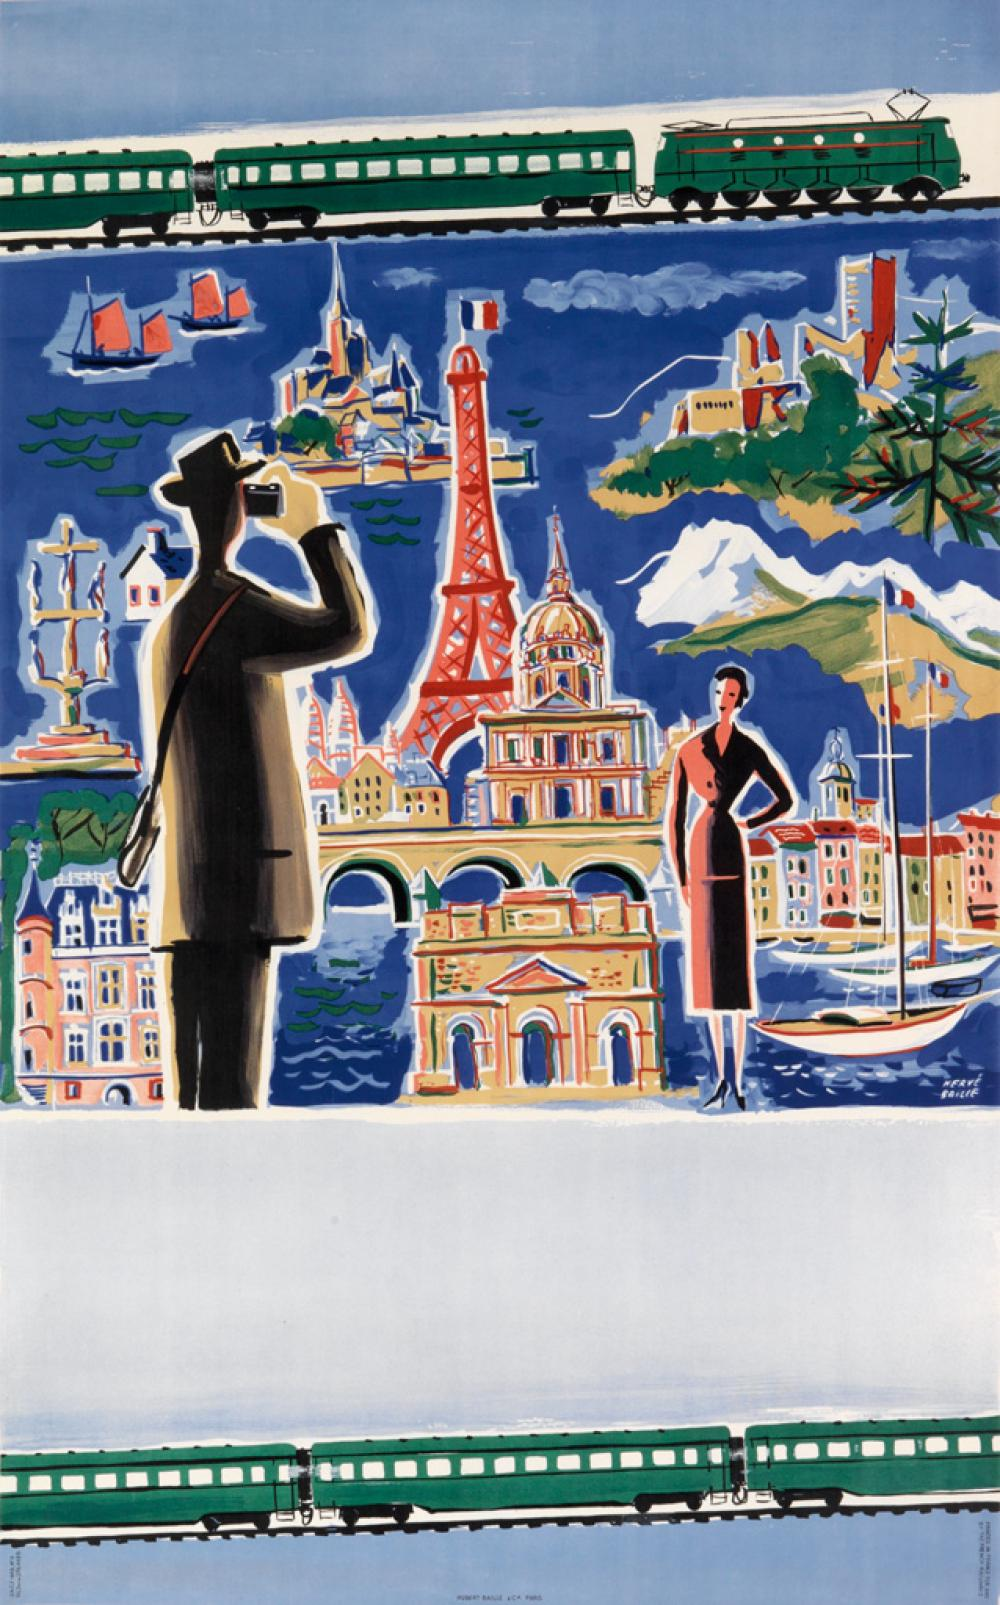 HERVÉ BAILLE (1896-1974). [S.N.C.F.] 1953. 39x25 inches, 101x64 cm. Hubert Baille, Paris.